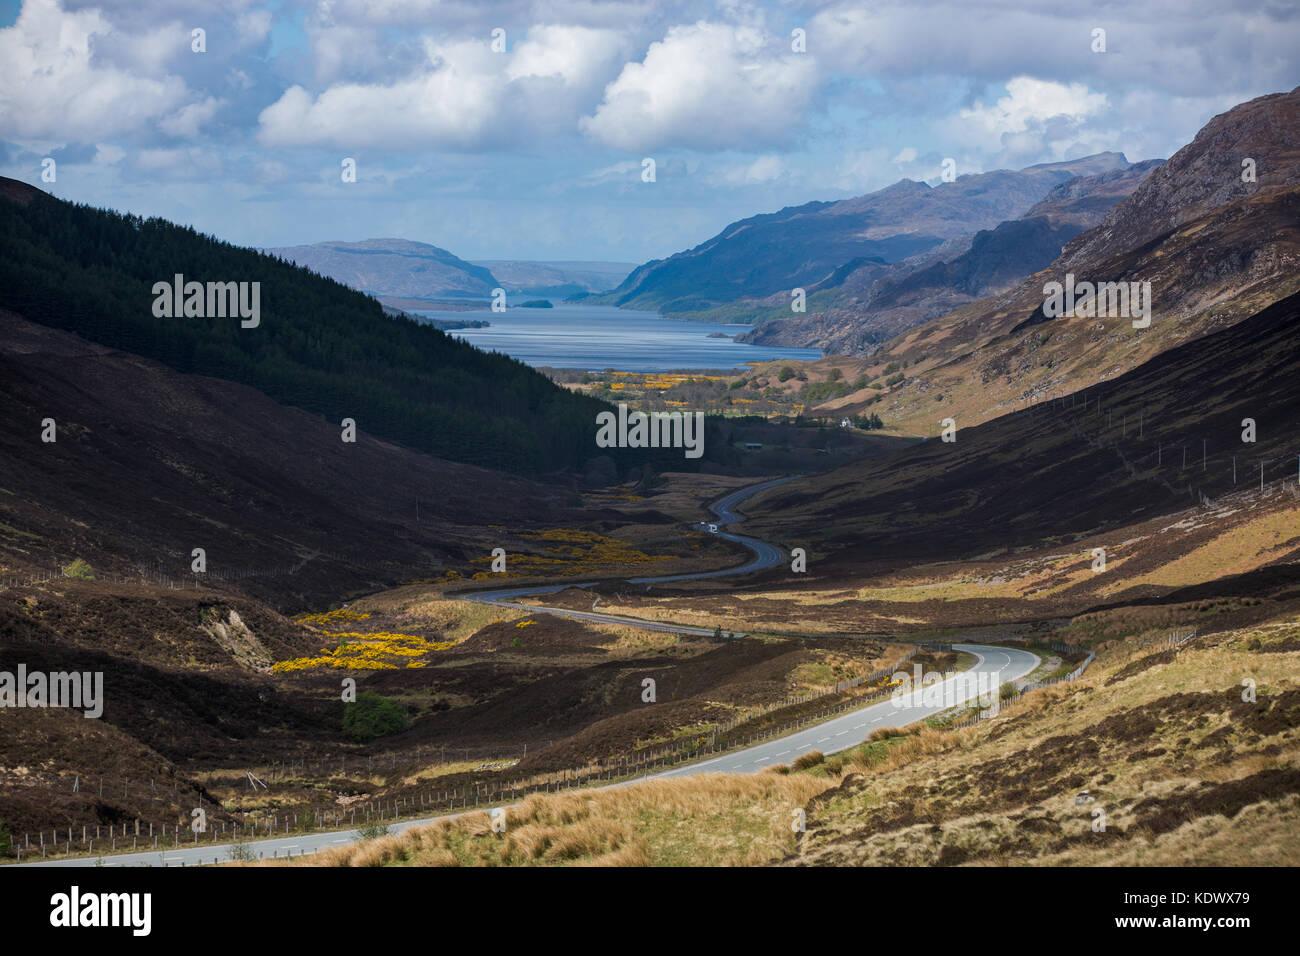 Glen docherty y la carretera de kinlochewe, Wester Ross, Escocia Imagen De Stock